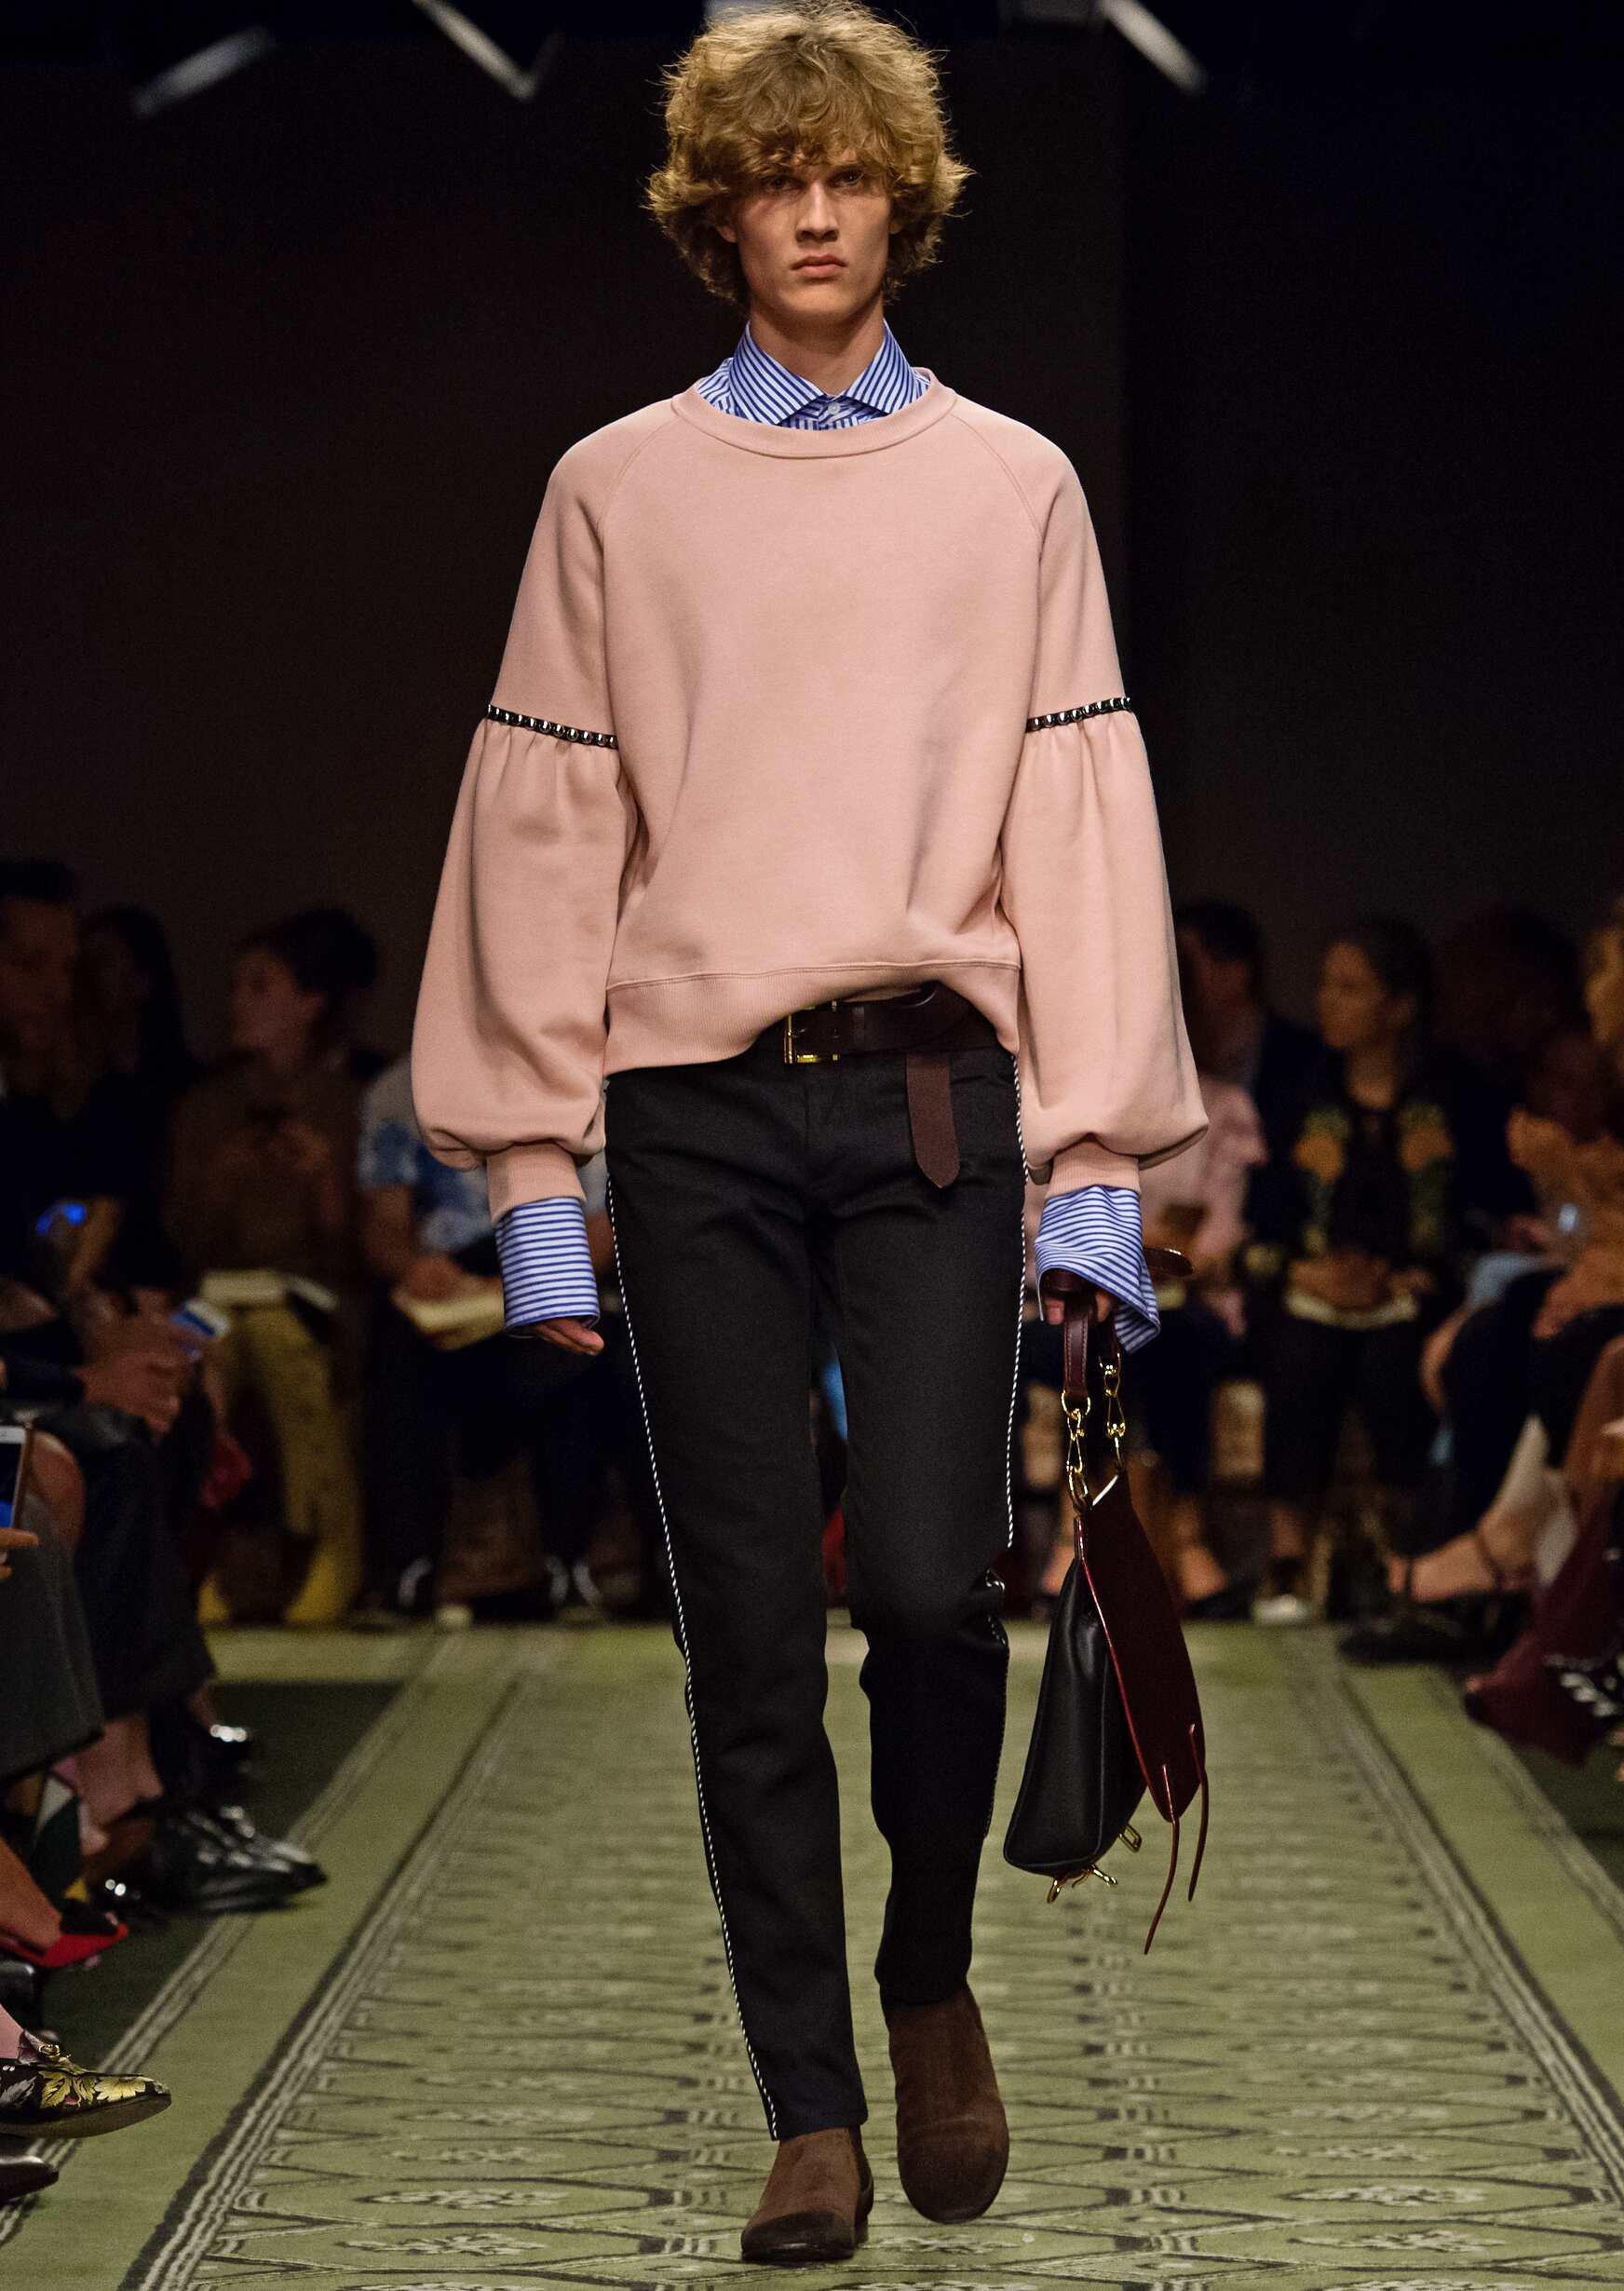 Man Fashion Trends 2017 Burberry